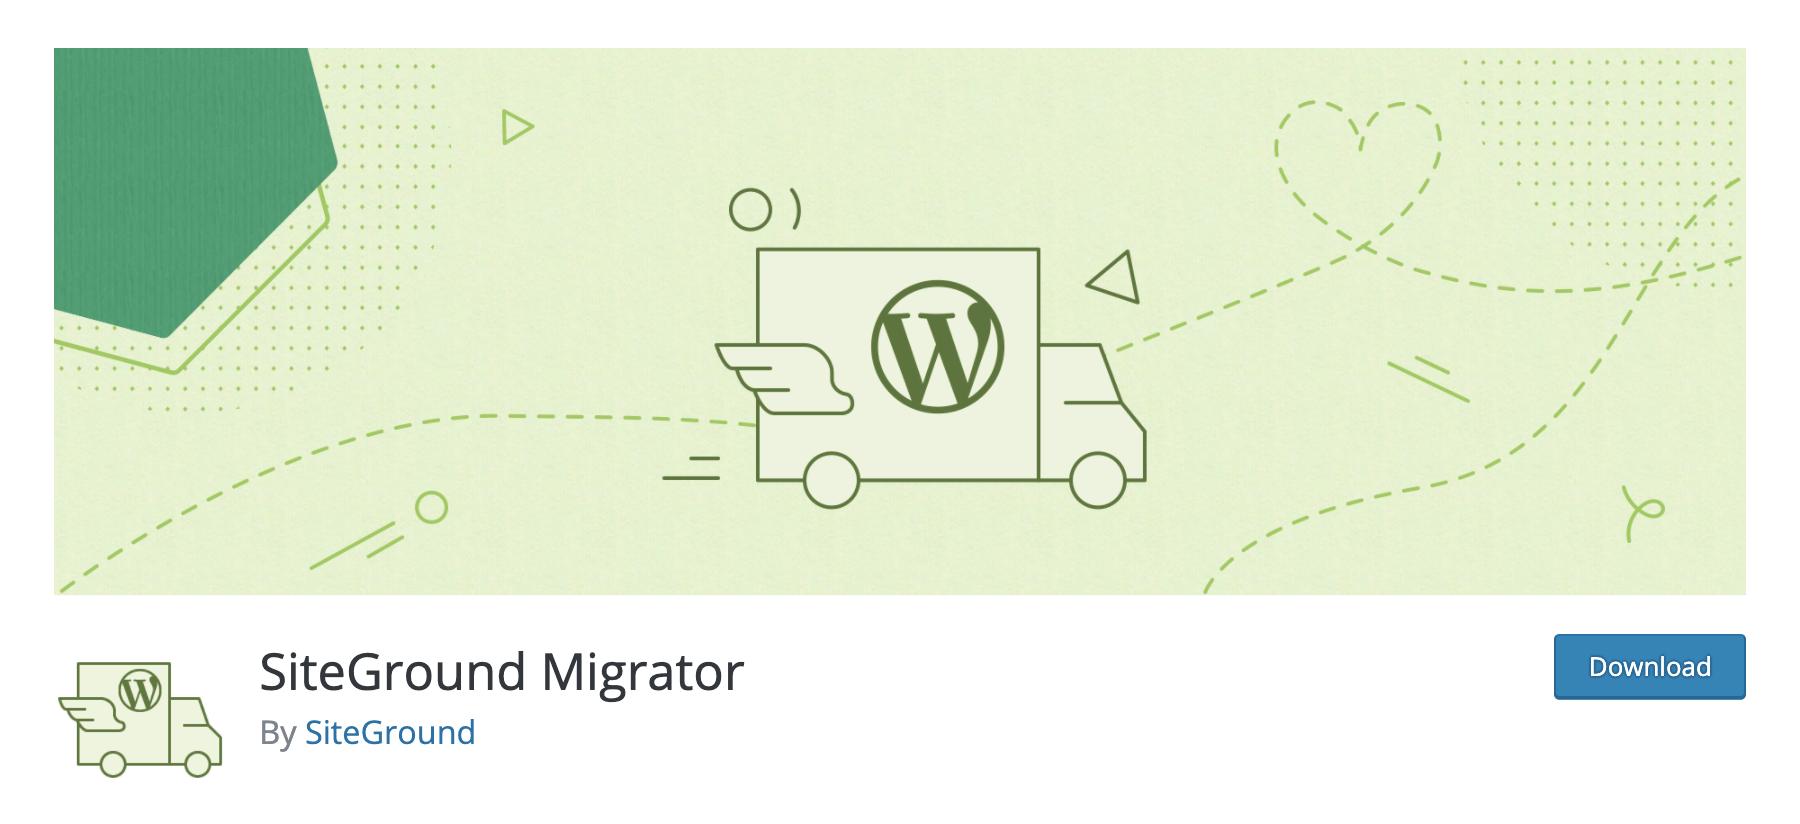 SiteGround Migrator WordPress Plugin